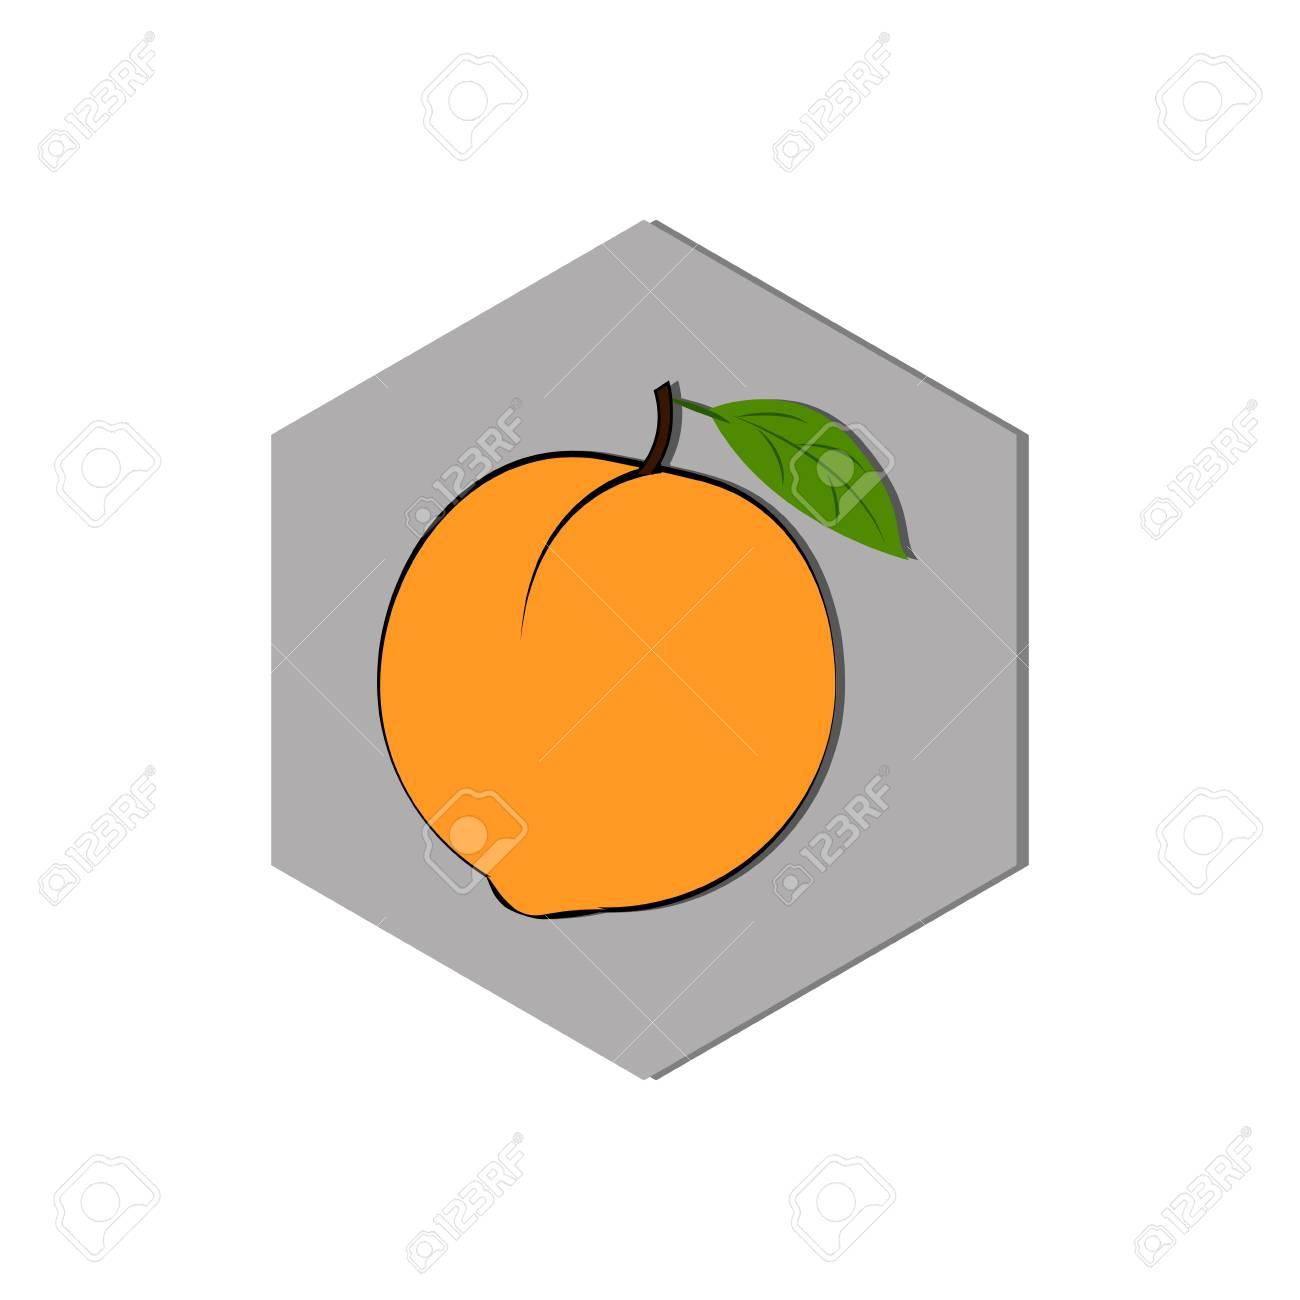 Orange Fruit Abstract Food Icon Illustration